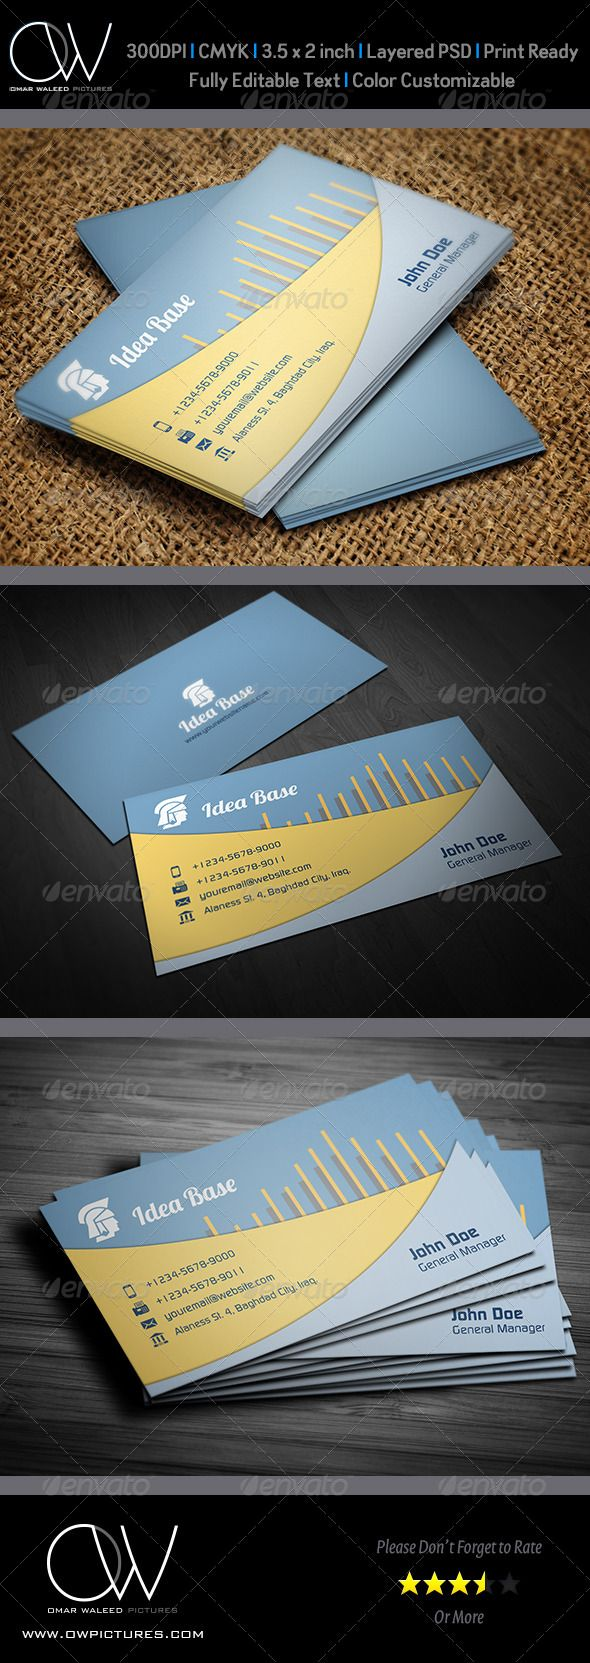 Corporate Business Card Vol29 Print TemplatesResume